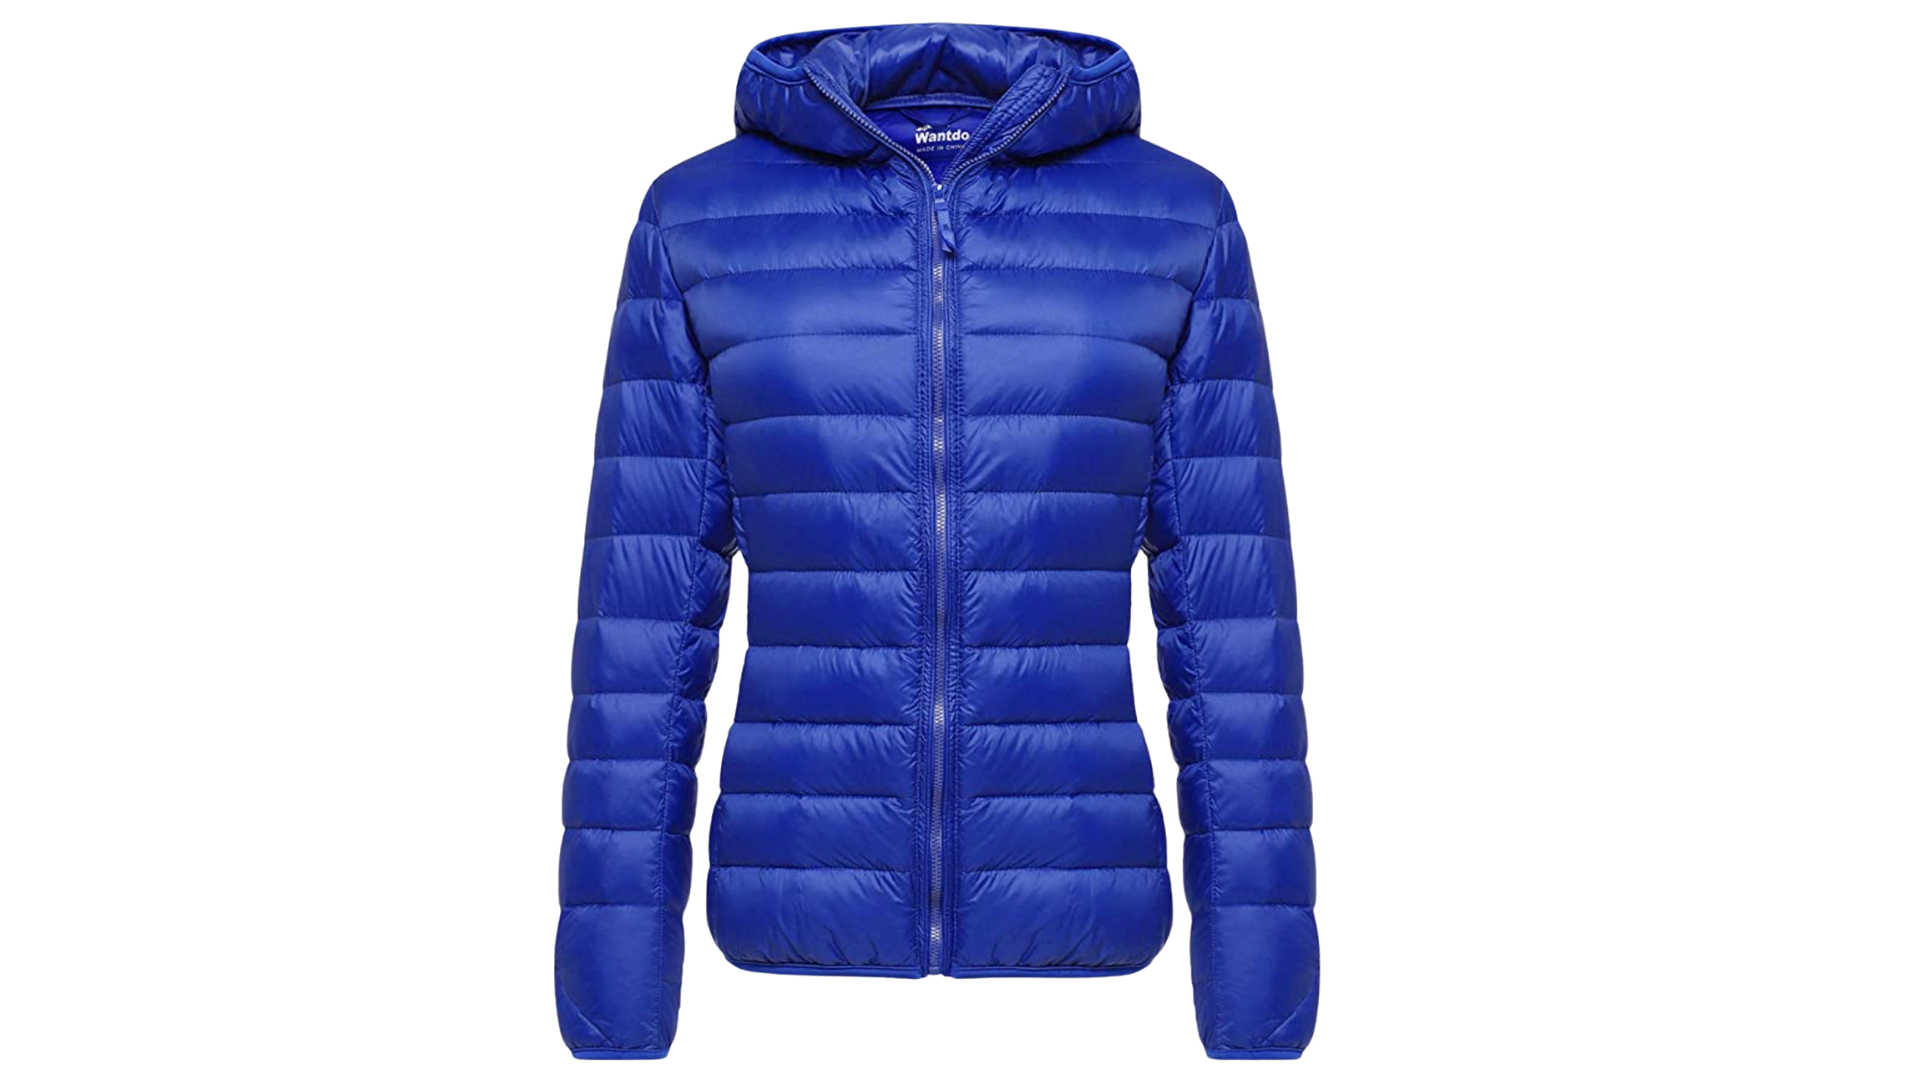 Wantdo best winter thermals